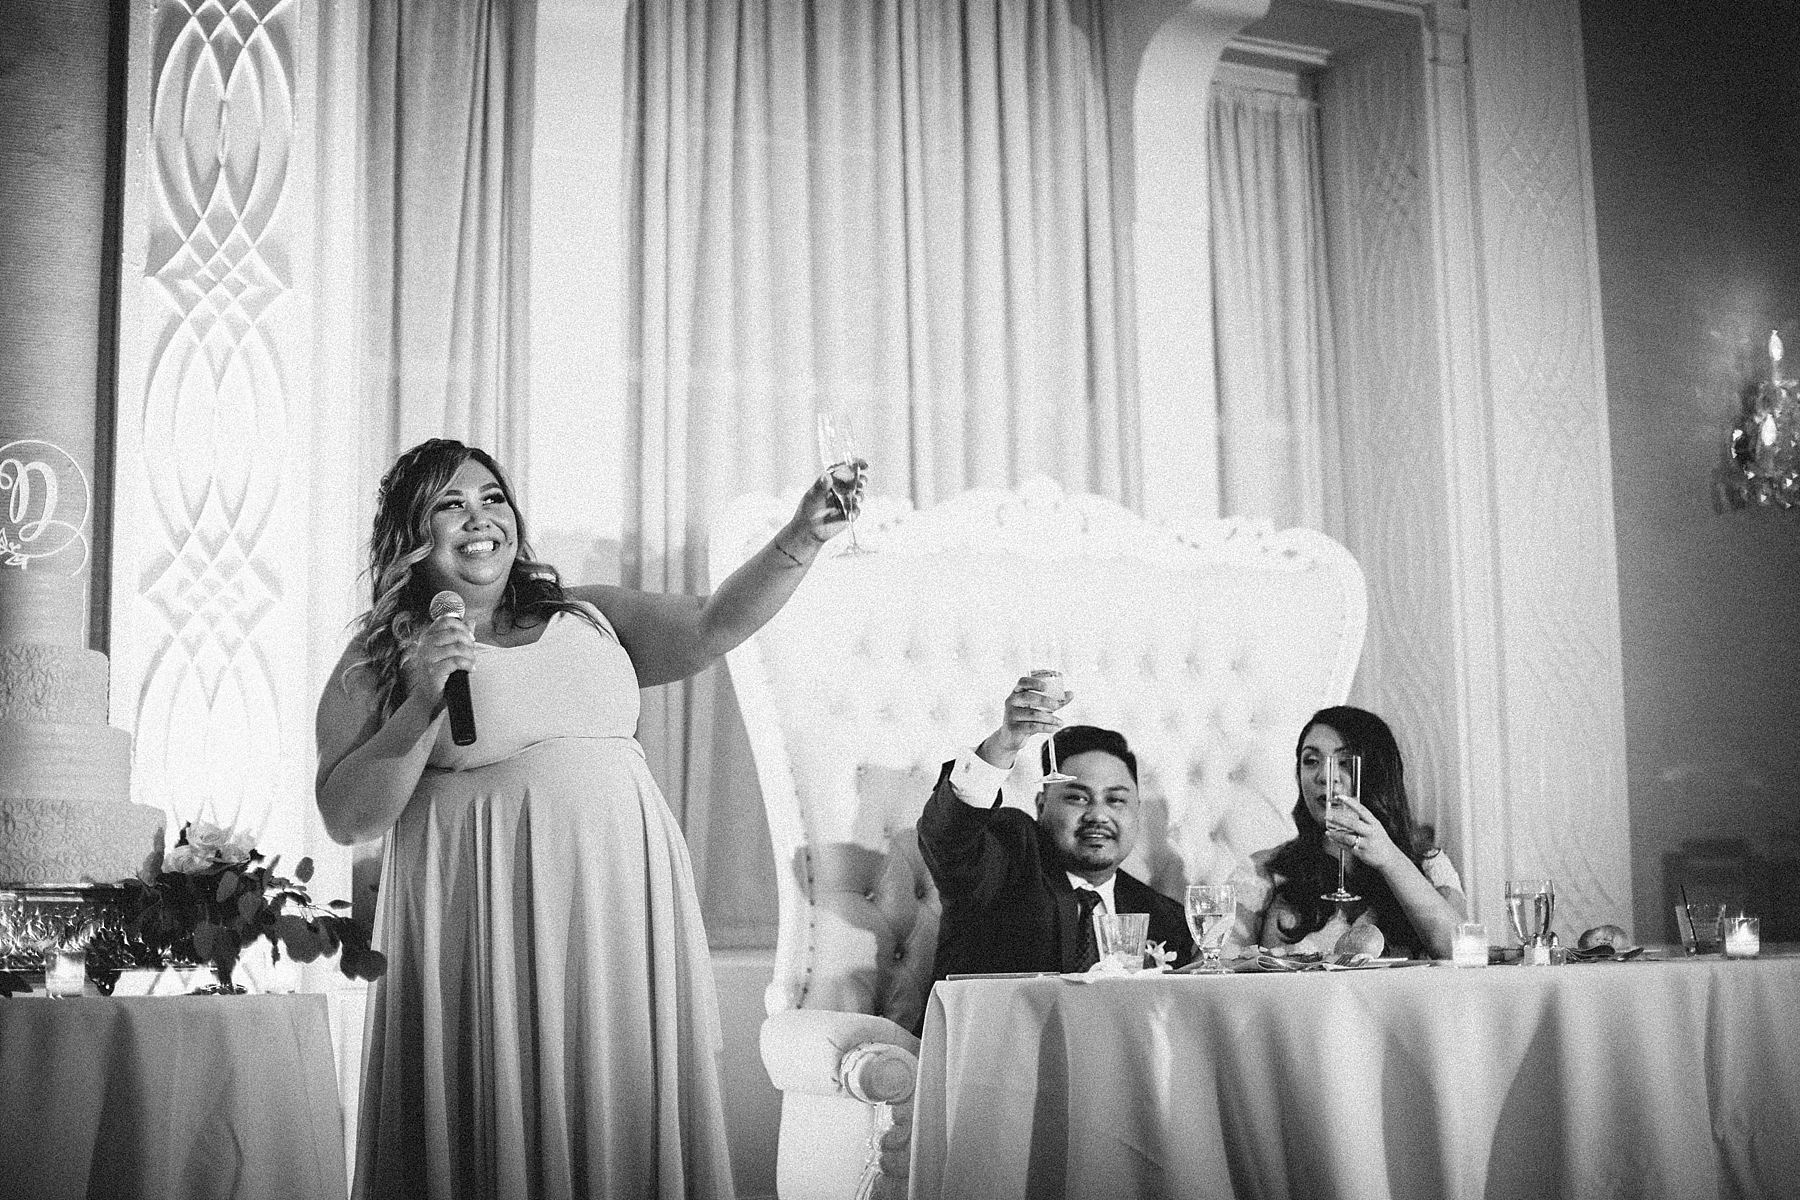 new_jersey_wedding_the_Berkeley_beach_asbury_photographer_0054.jpg